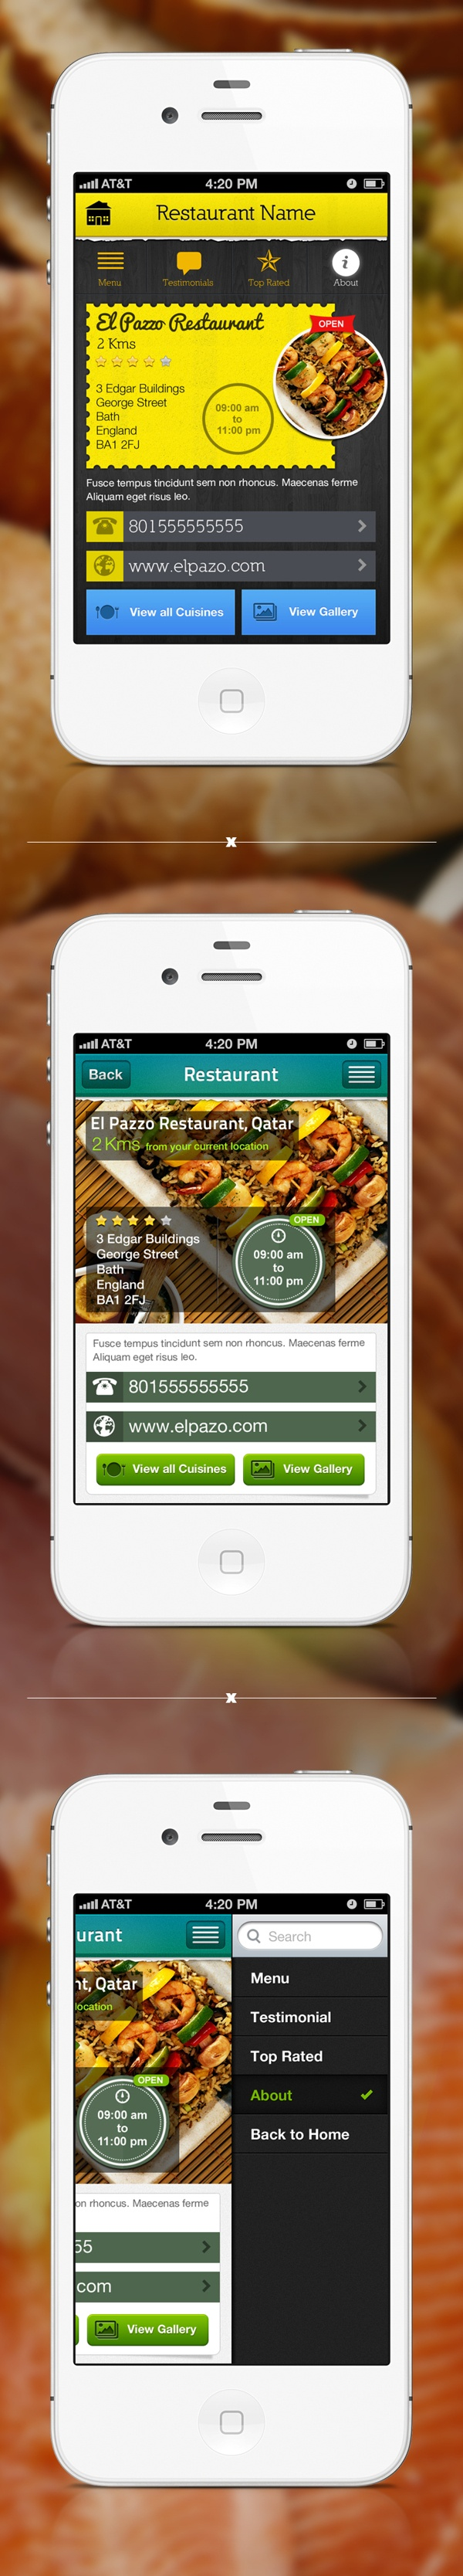 Life Style App- Suggestions by Rahul raj, via Behance